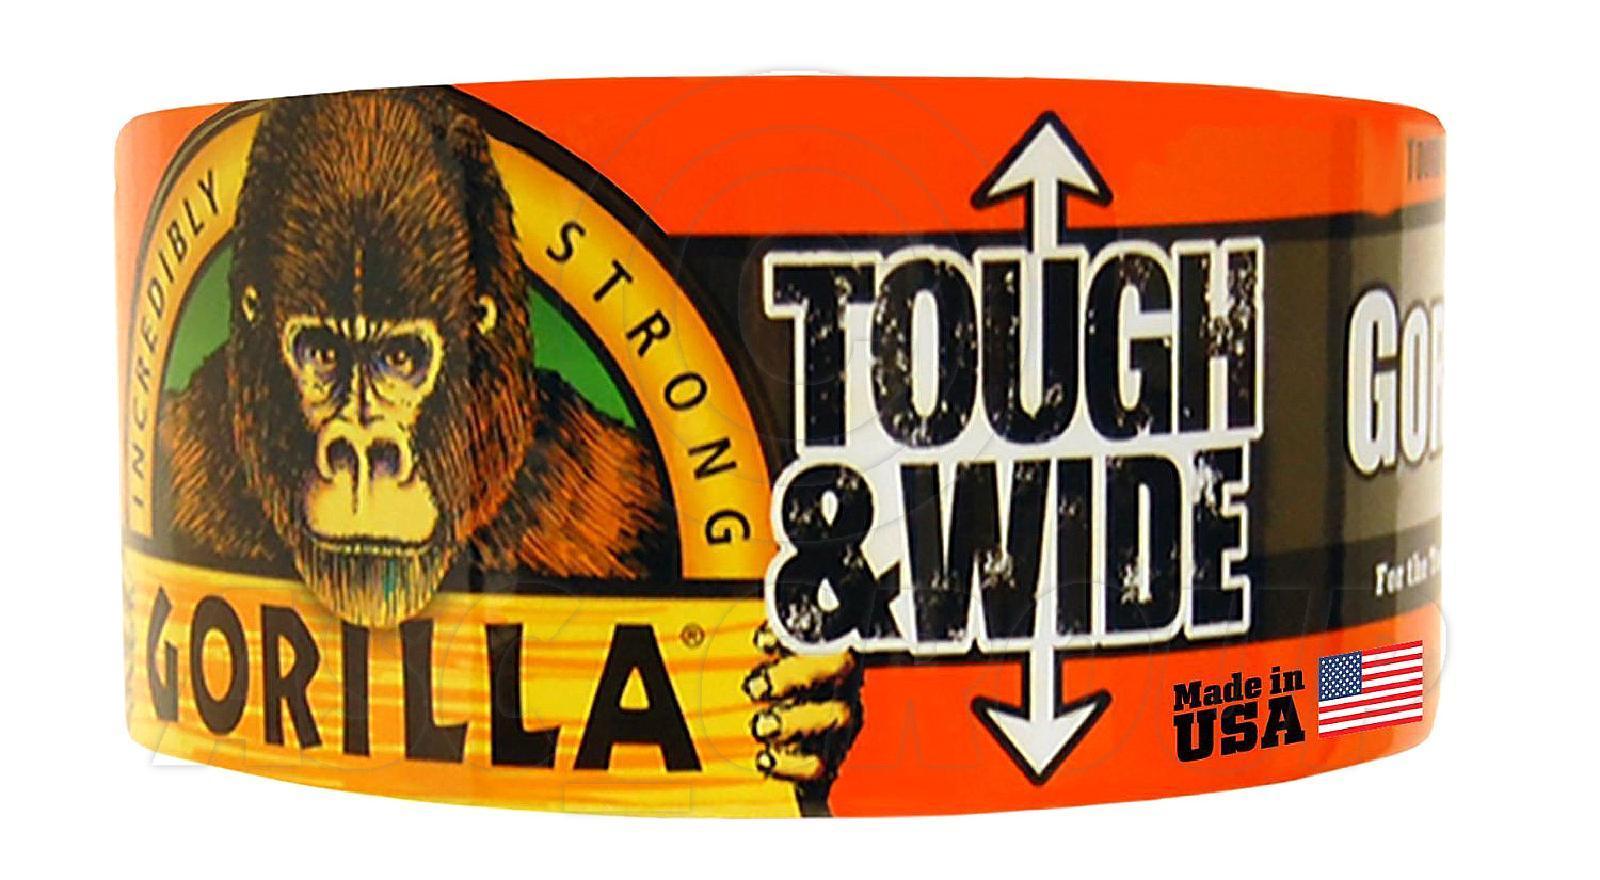 Gorilla Glue Tape - Tough And Wide, Handy Roll & Standard ...